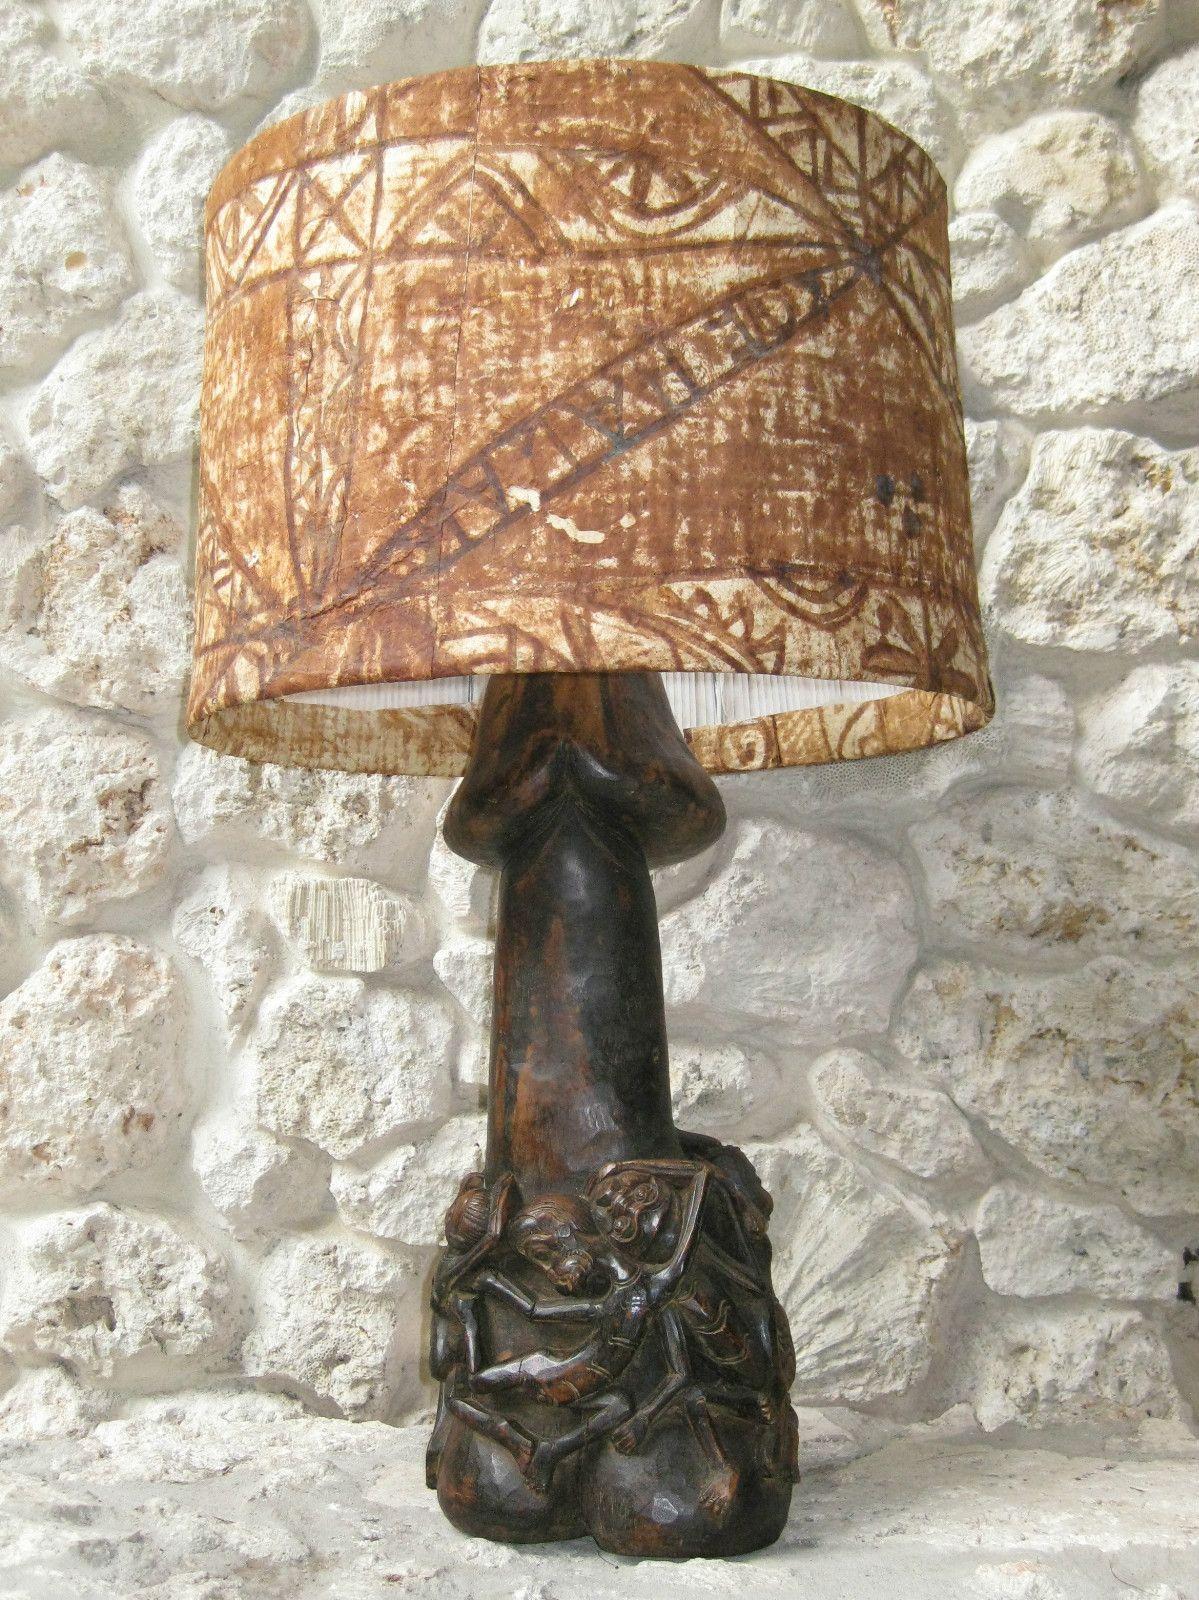 Borneo Fertility Penis Shape Lamp Sculpture Baron Sepy Dobronyi Estate Sale L726 Fertility